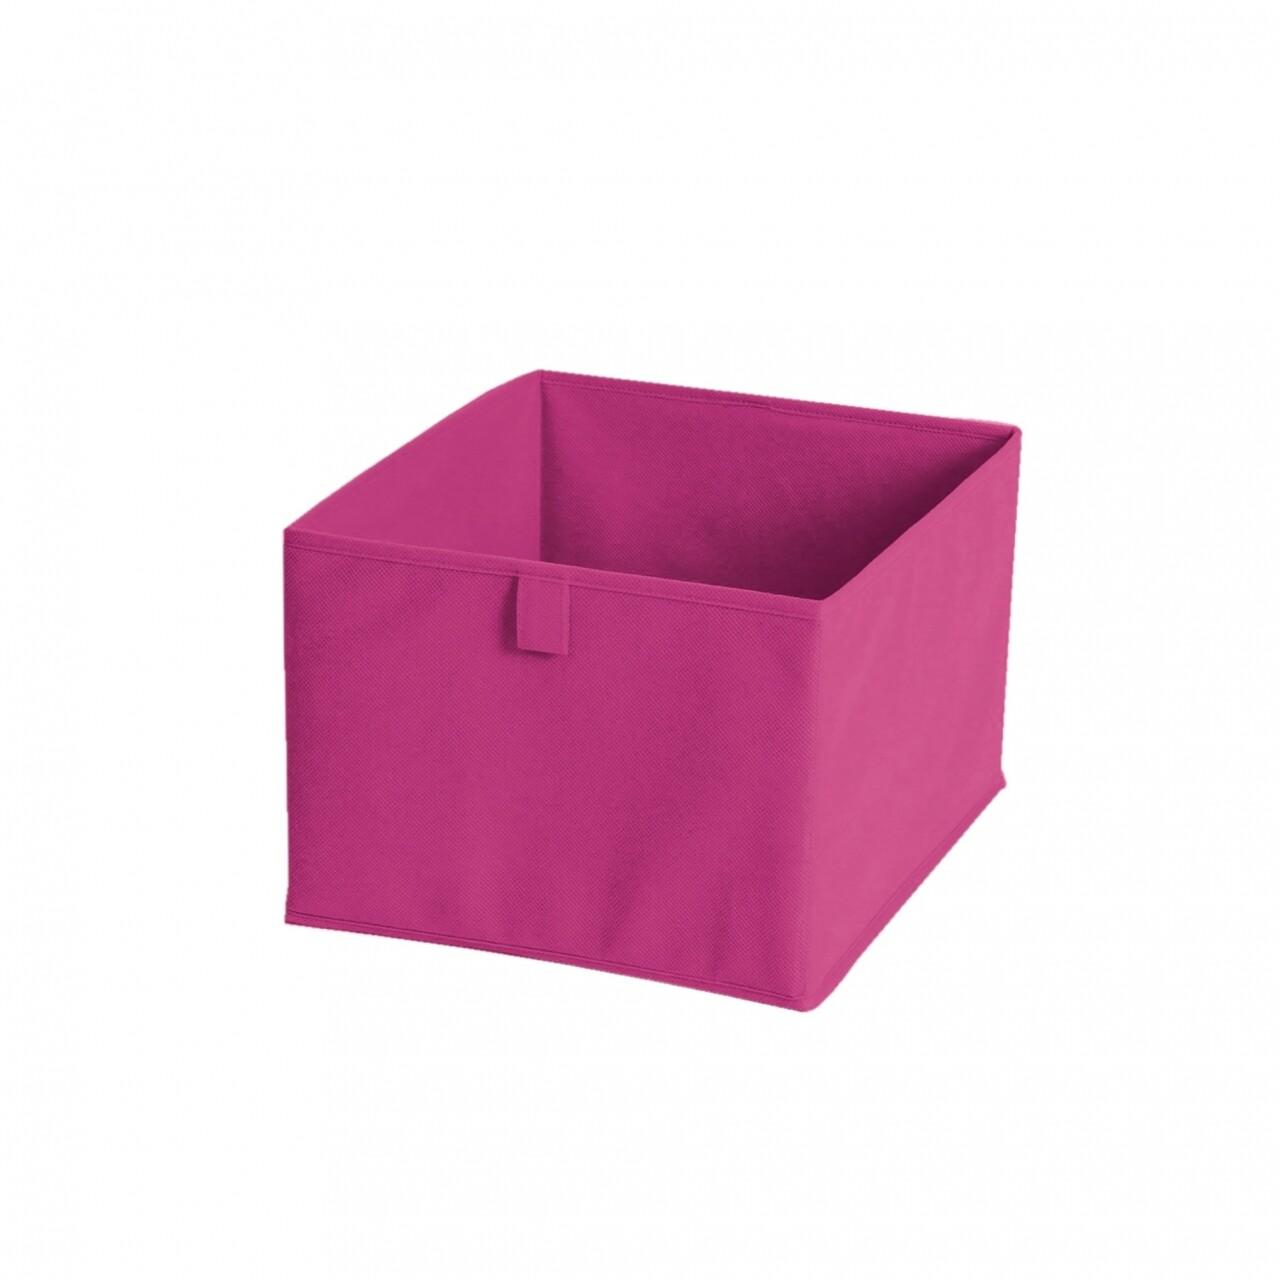 Cutie de depozitare Fuchsia, Jocca, 19 x 30 x 30 cm, PVC, roz